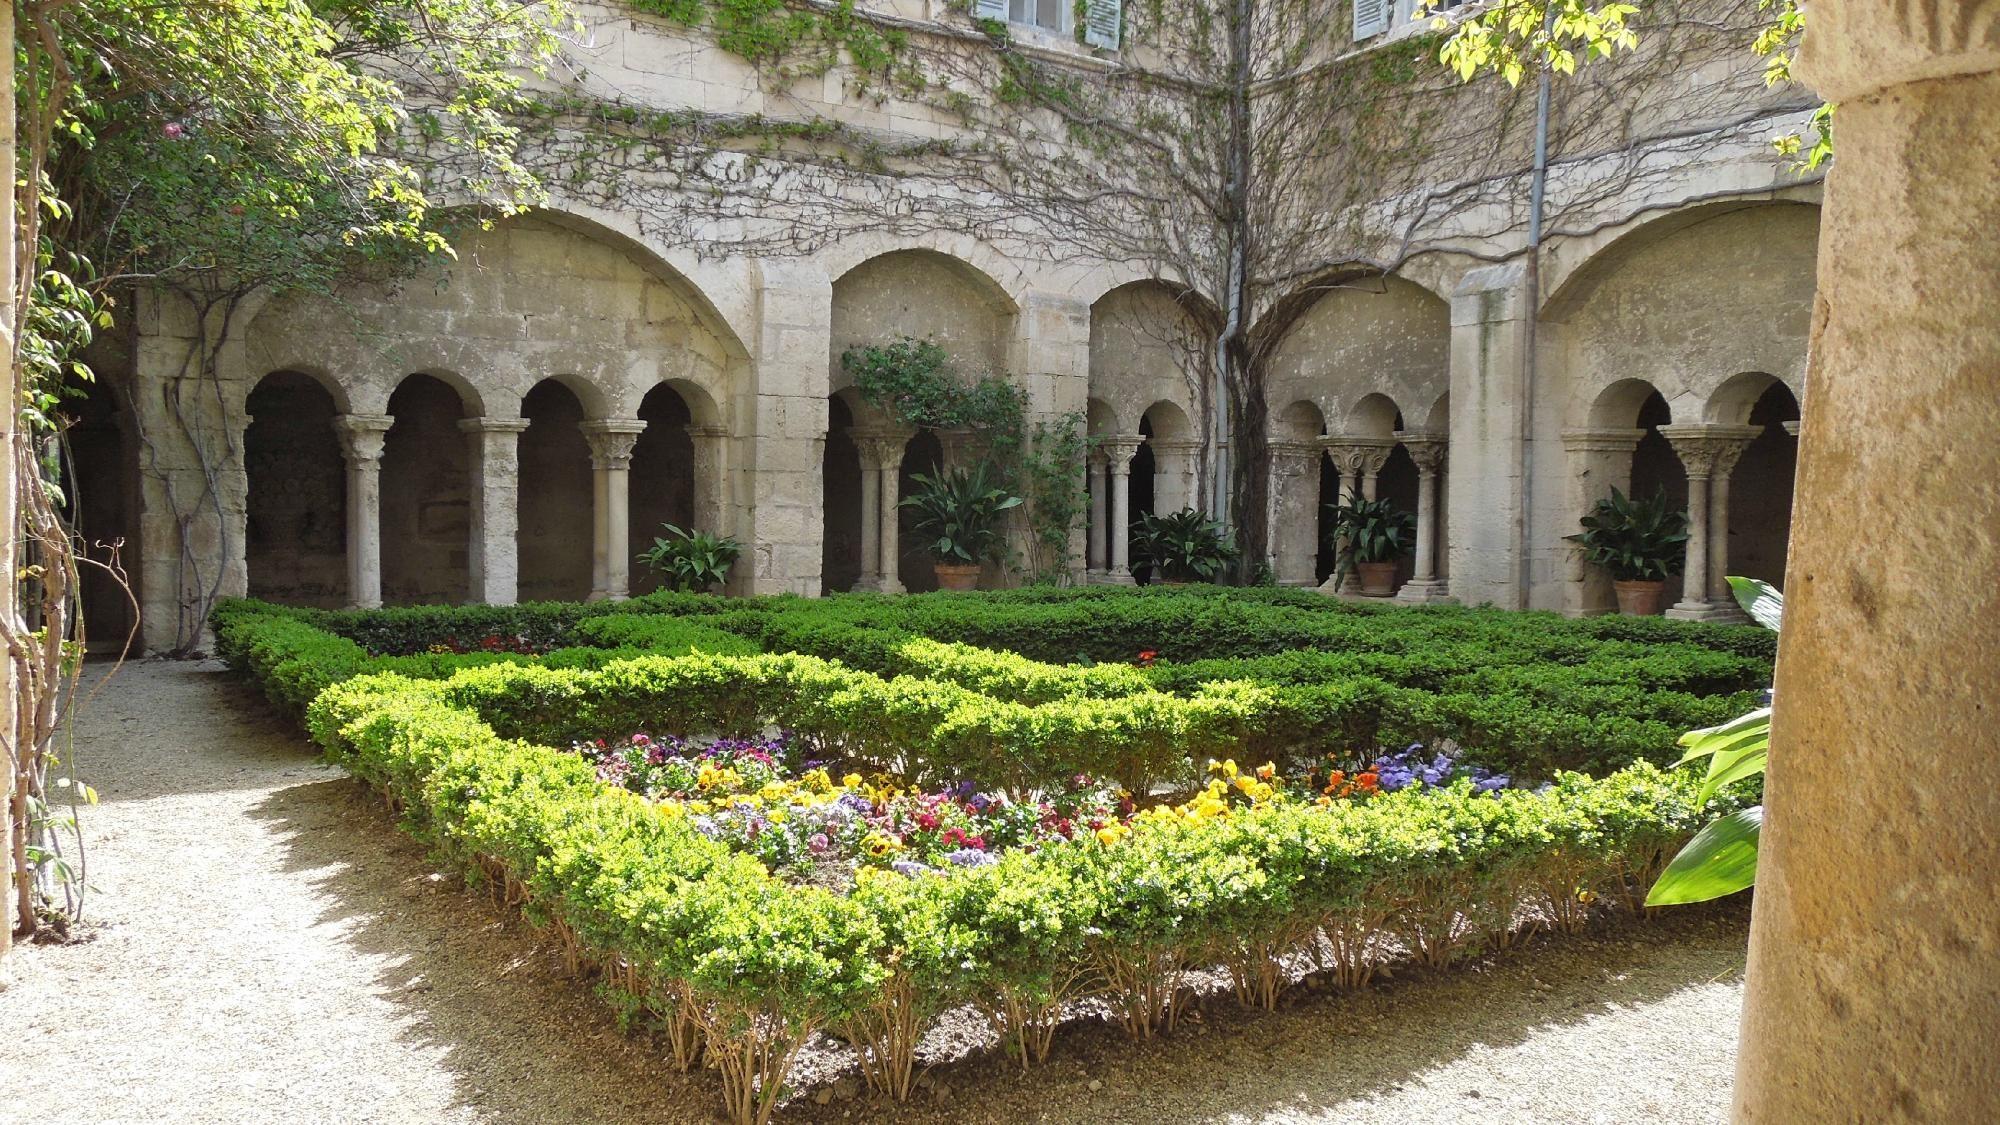 St. Paul de Mausolee Trip advisor, Provence, France